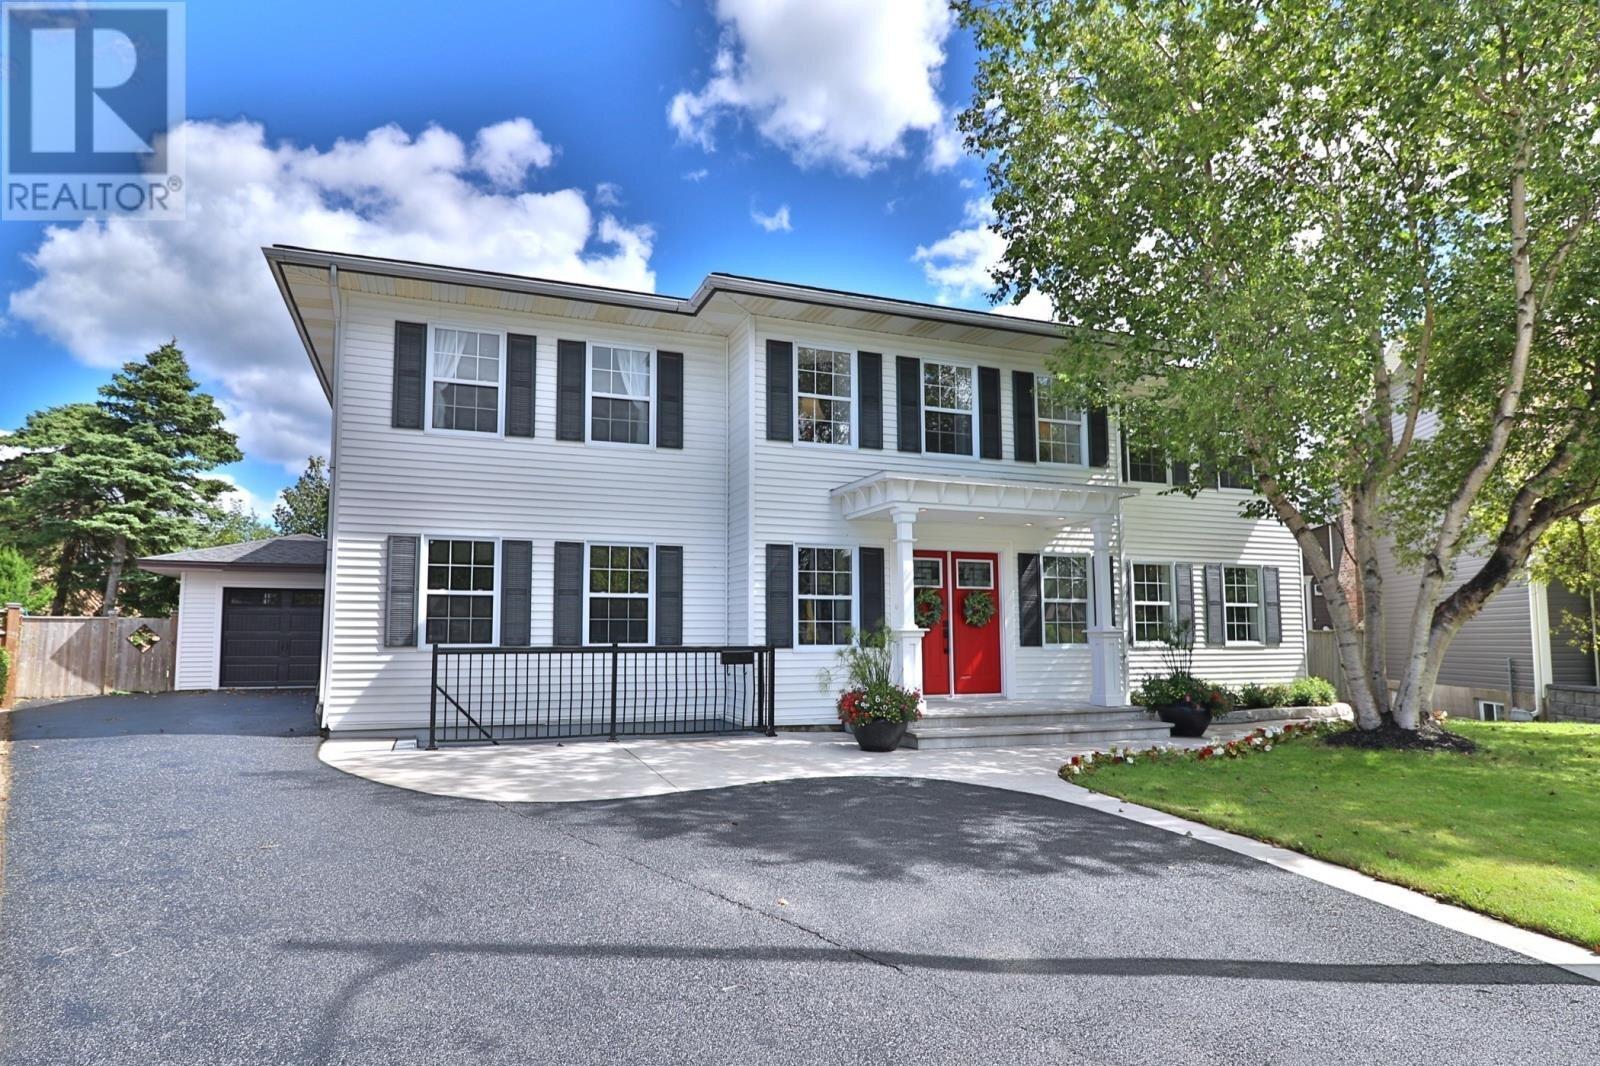 House for sale at 25 Mountbatten Dr St. John's Newfoundland - MLS: 1222578